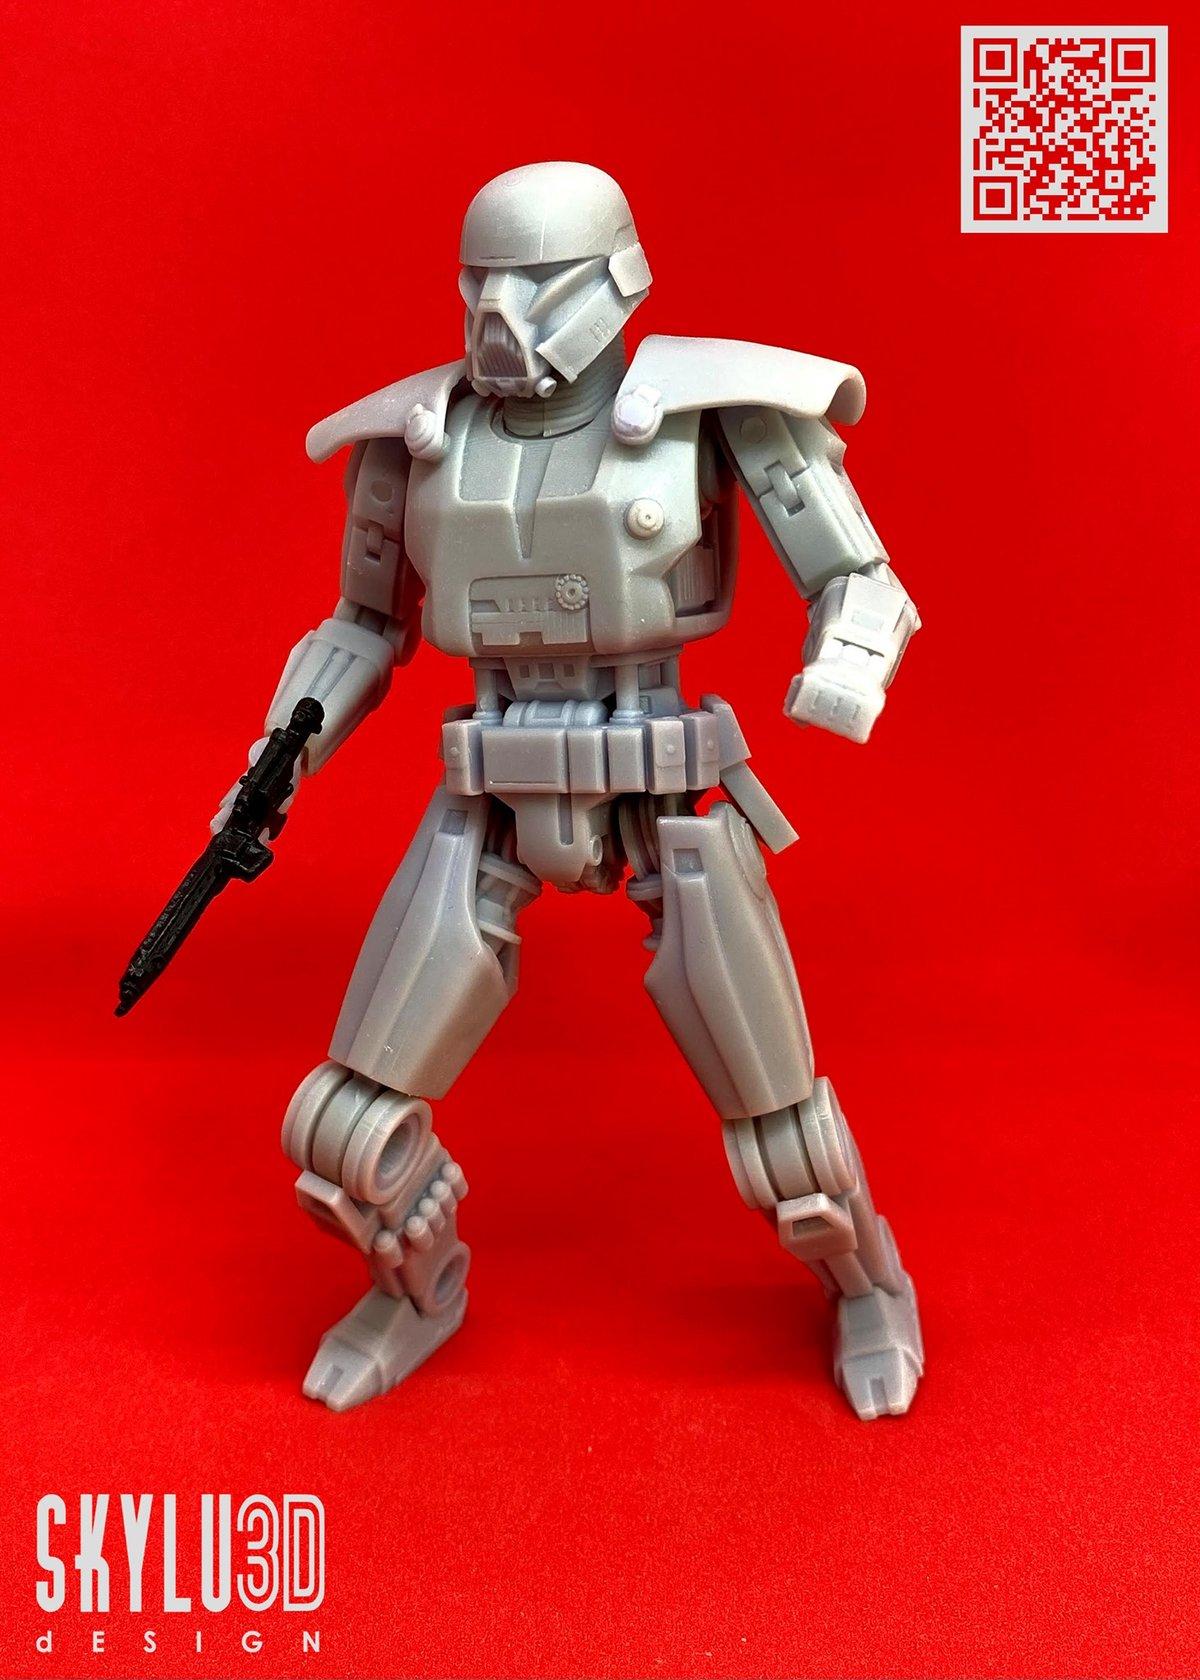 Image of Dark Robot model kit by Skylu3D Design